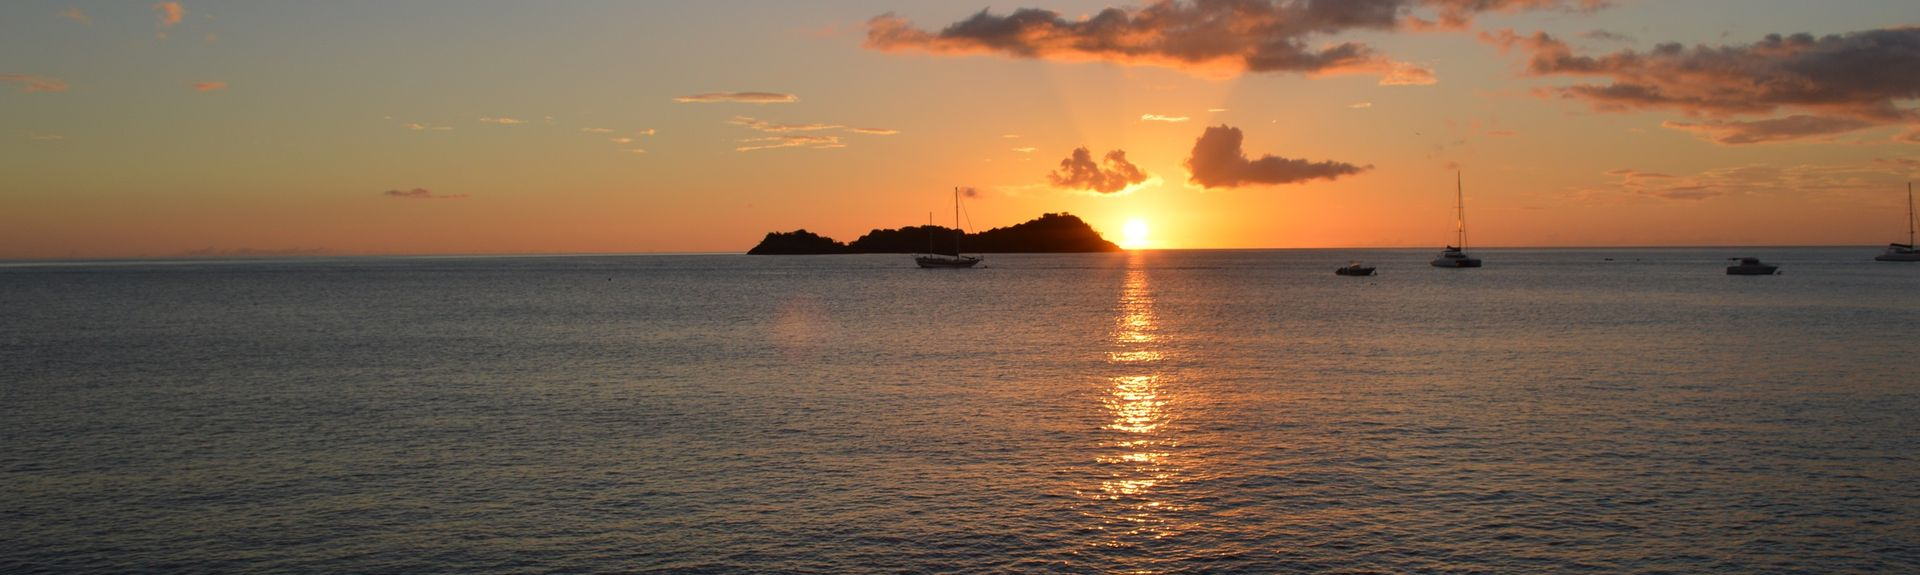 Goyave, Guadeloupe